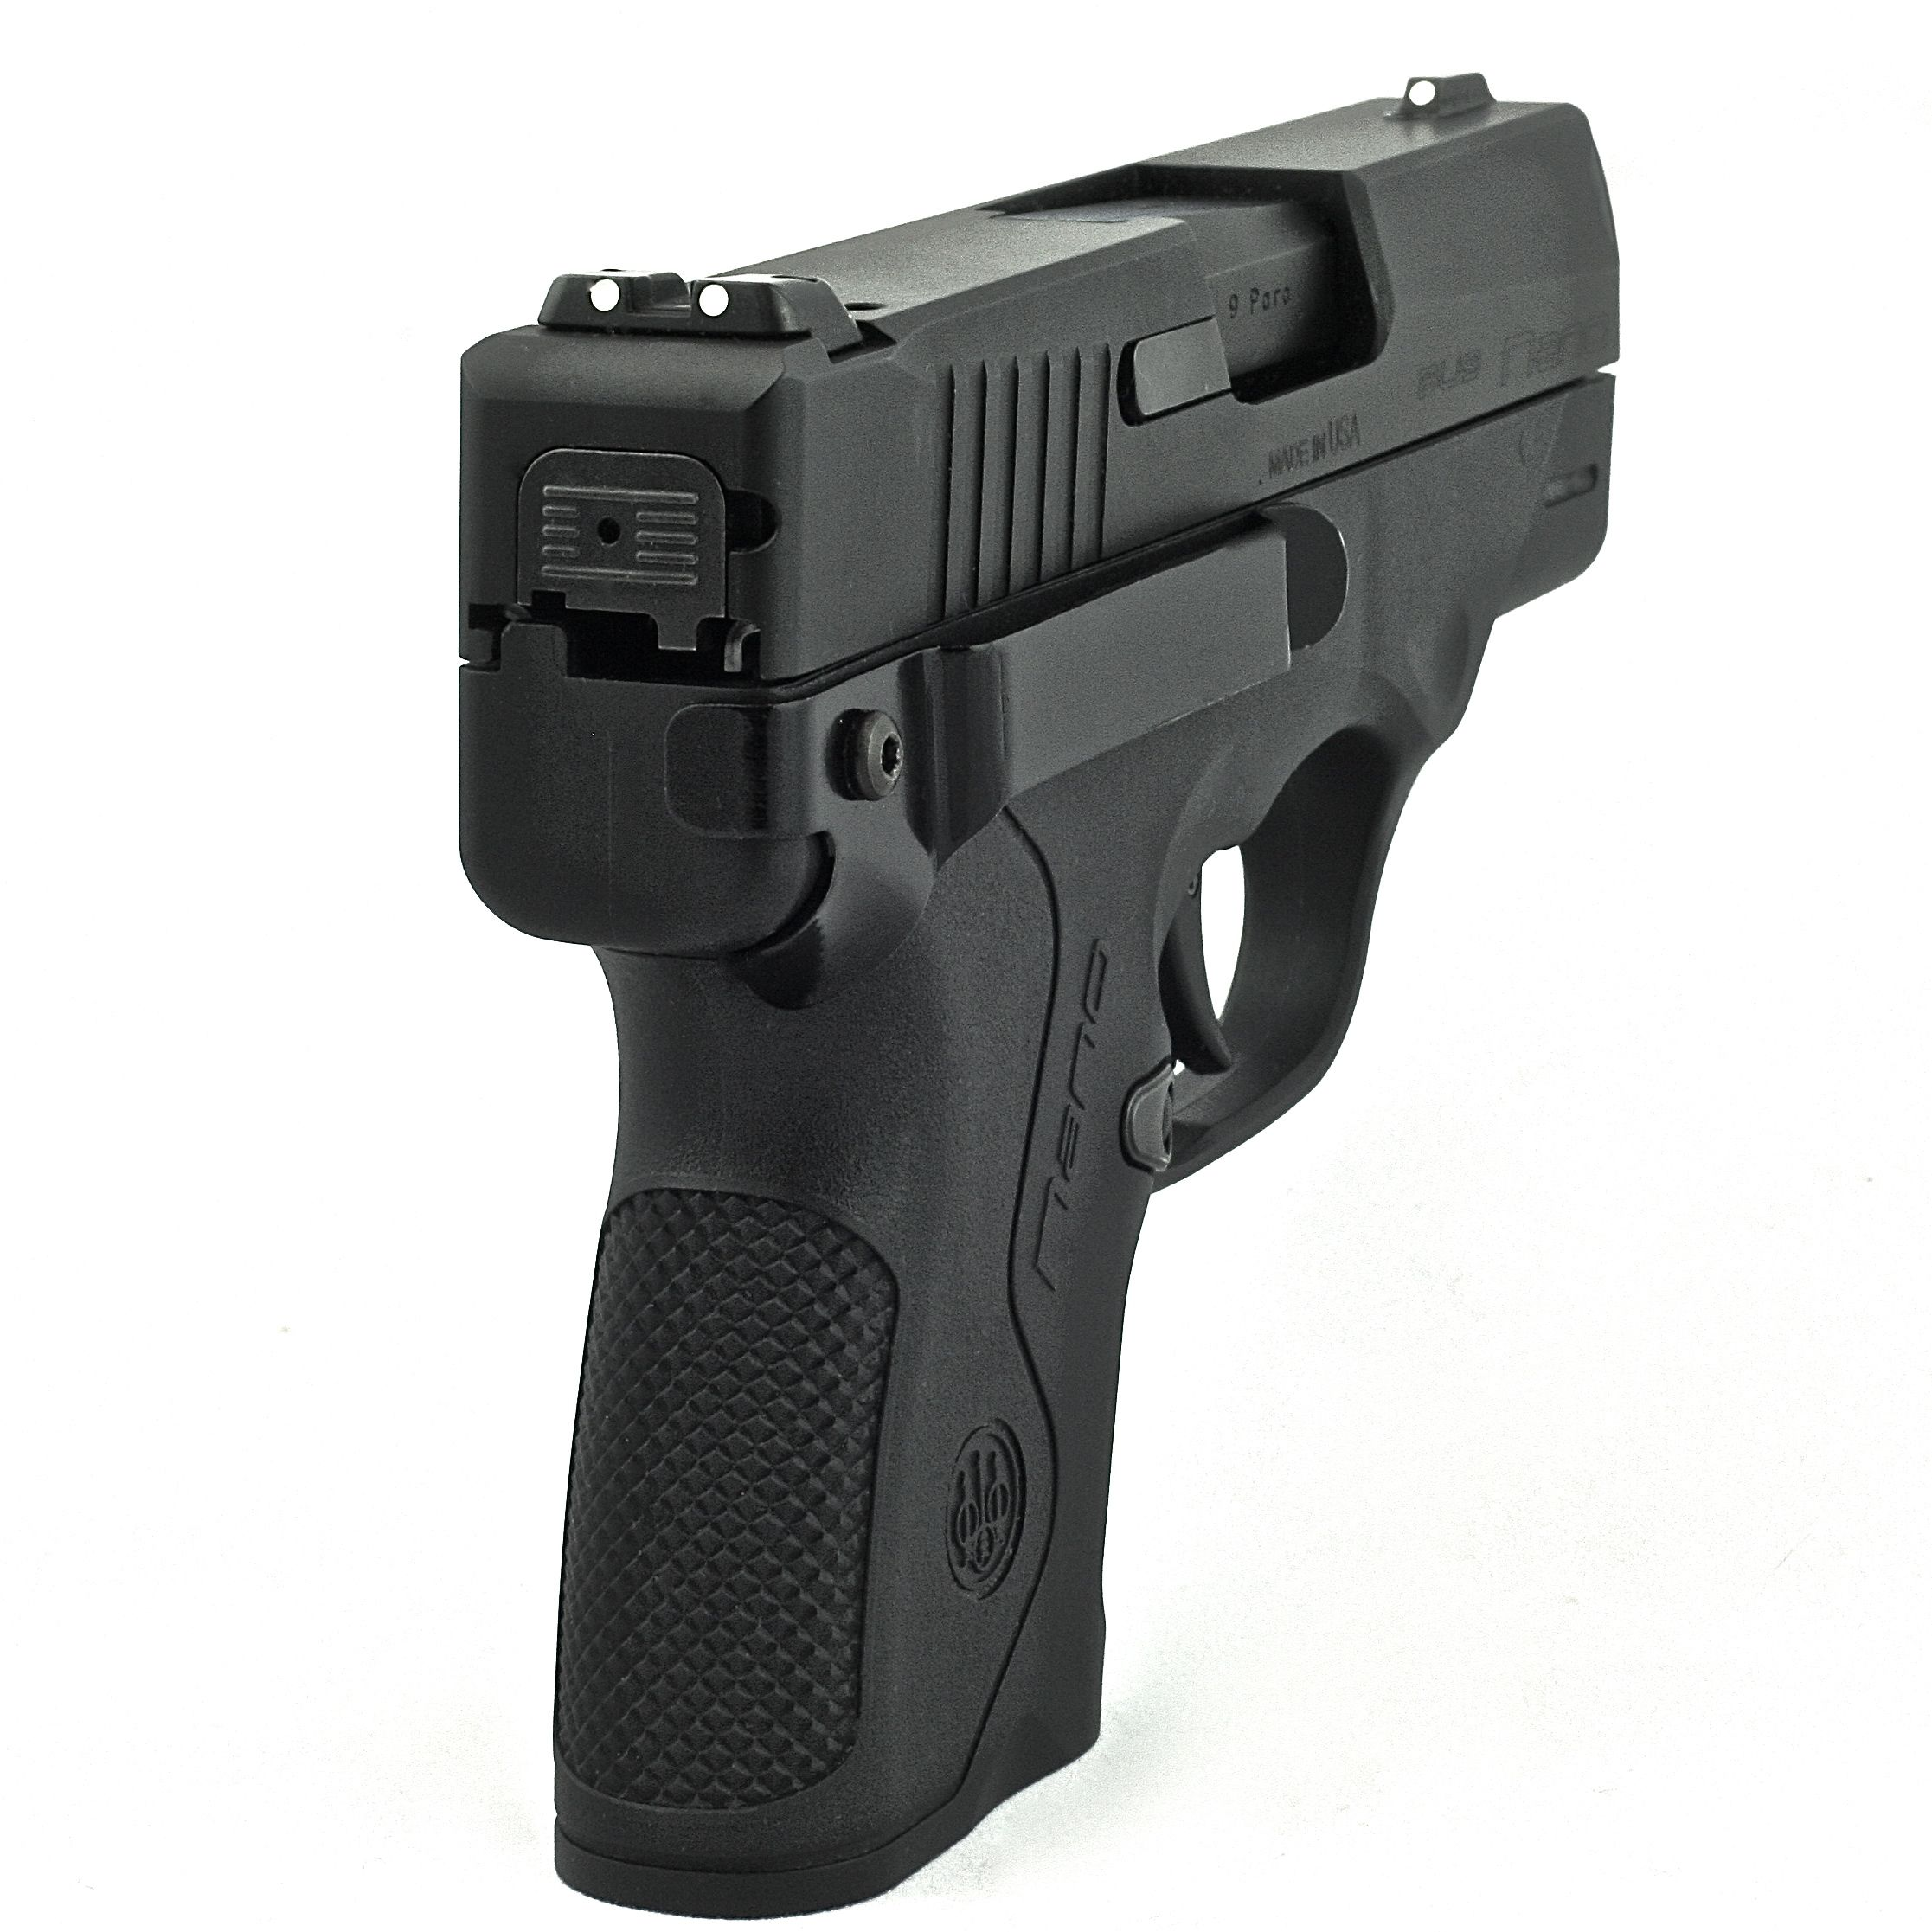 Beretta Nano, Concealed Carry, Techna Clip, 2nd ammendment